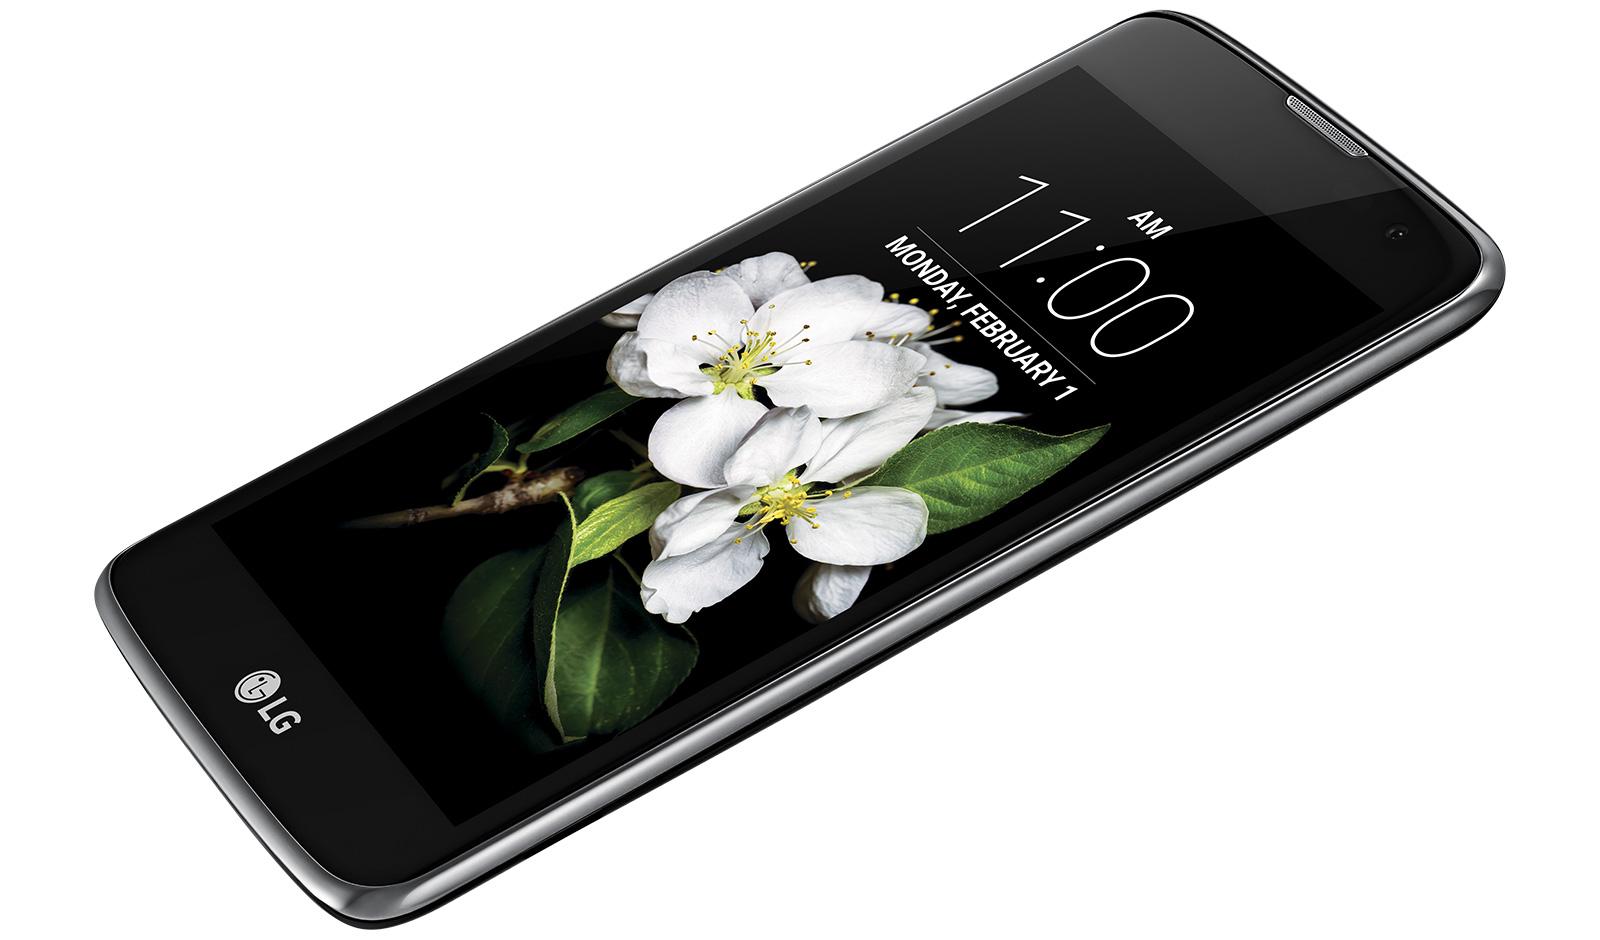 LG K7 Smartphone Review - NotebookCheck.net Reviews